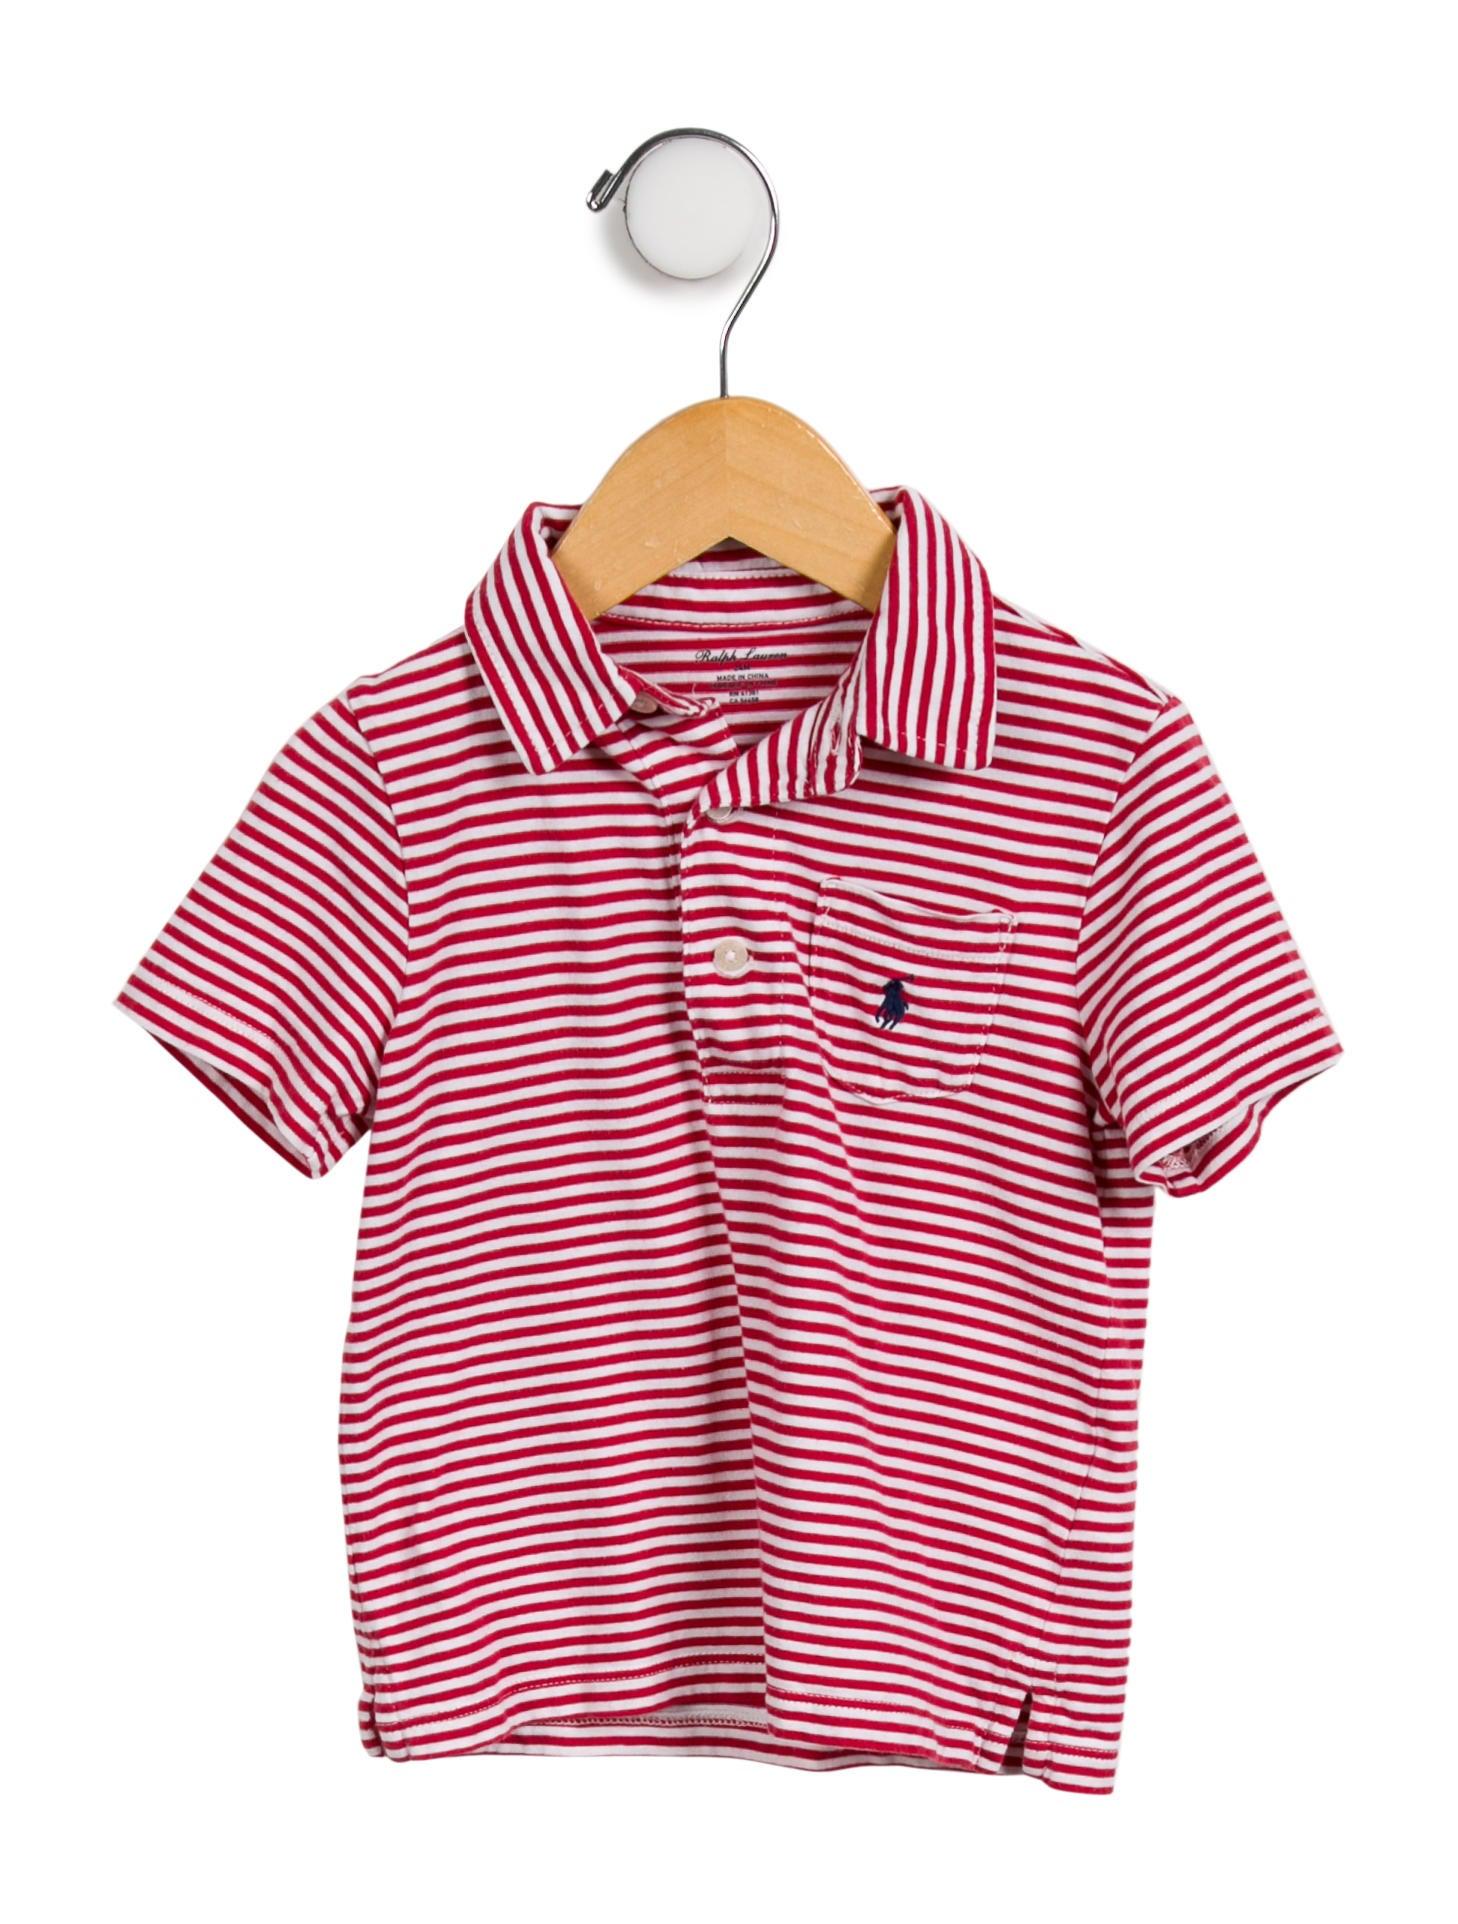 Ralph Lauren Boys Striped Polo Shirt Boys Wyg31804 The Realreal